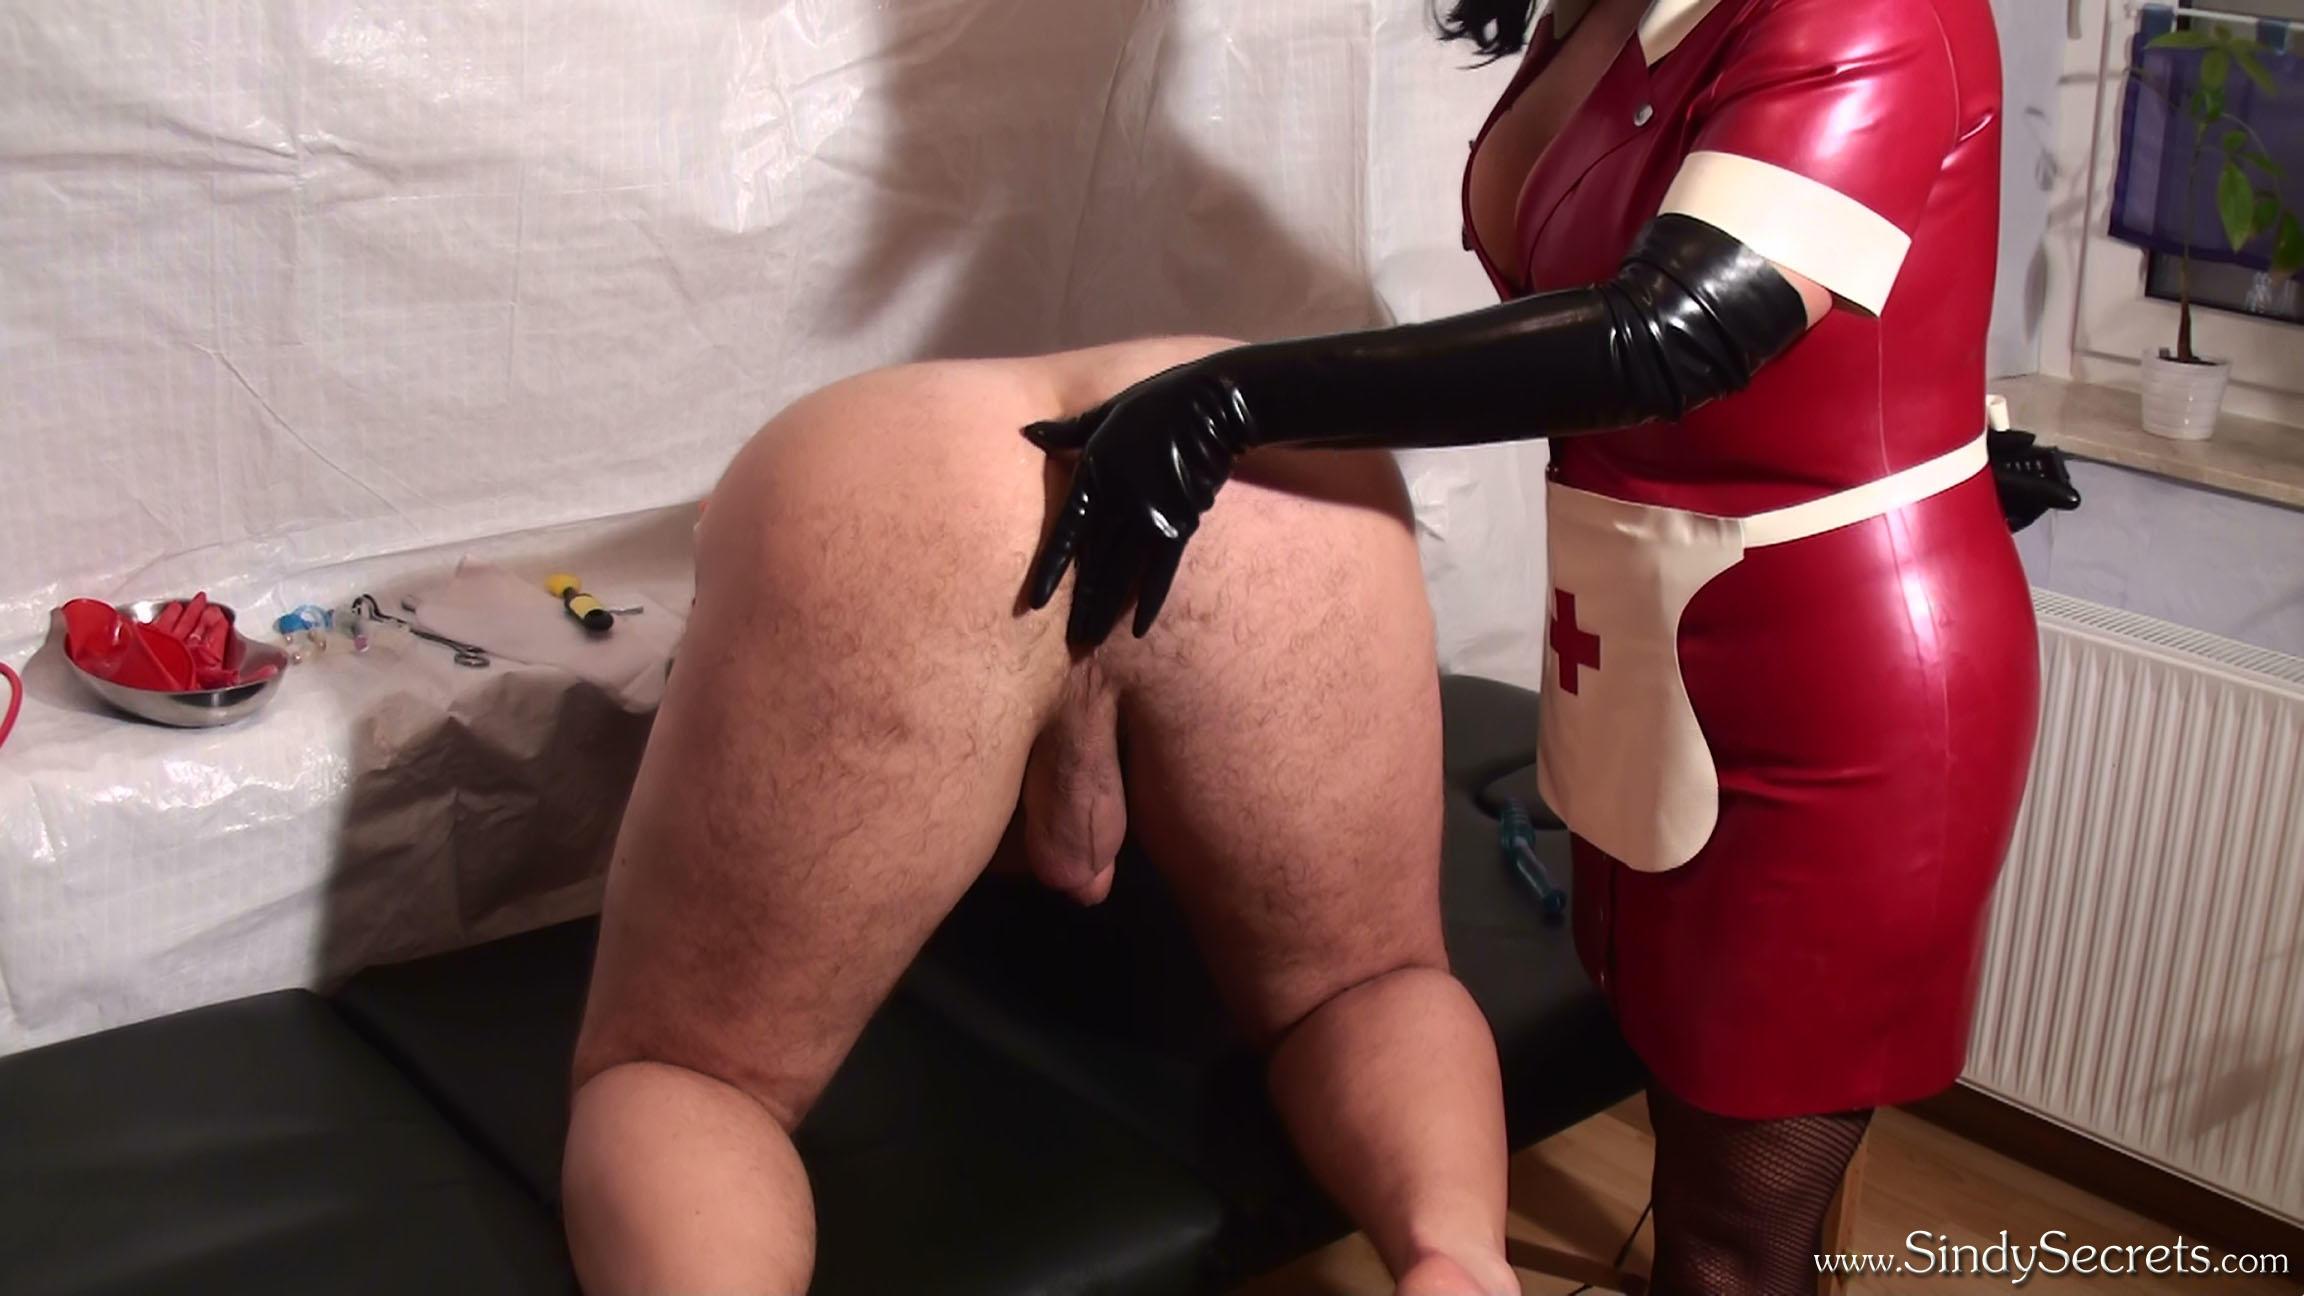 Nurse In Latex Gloves Gives A Handjob - Nurse Nicole -2964